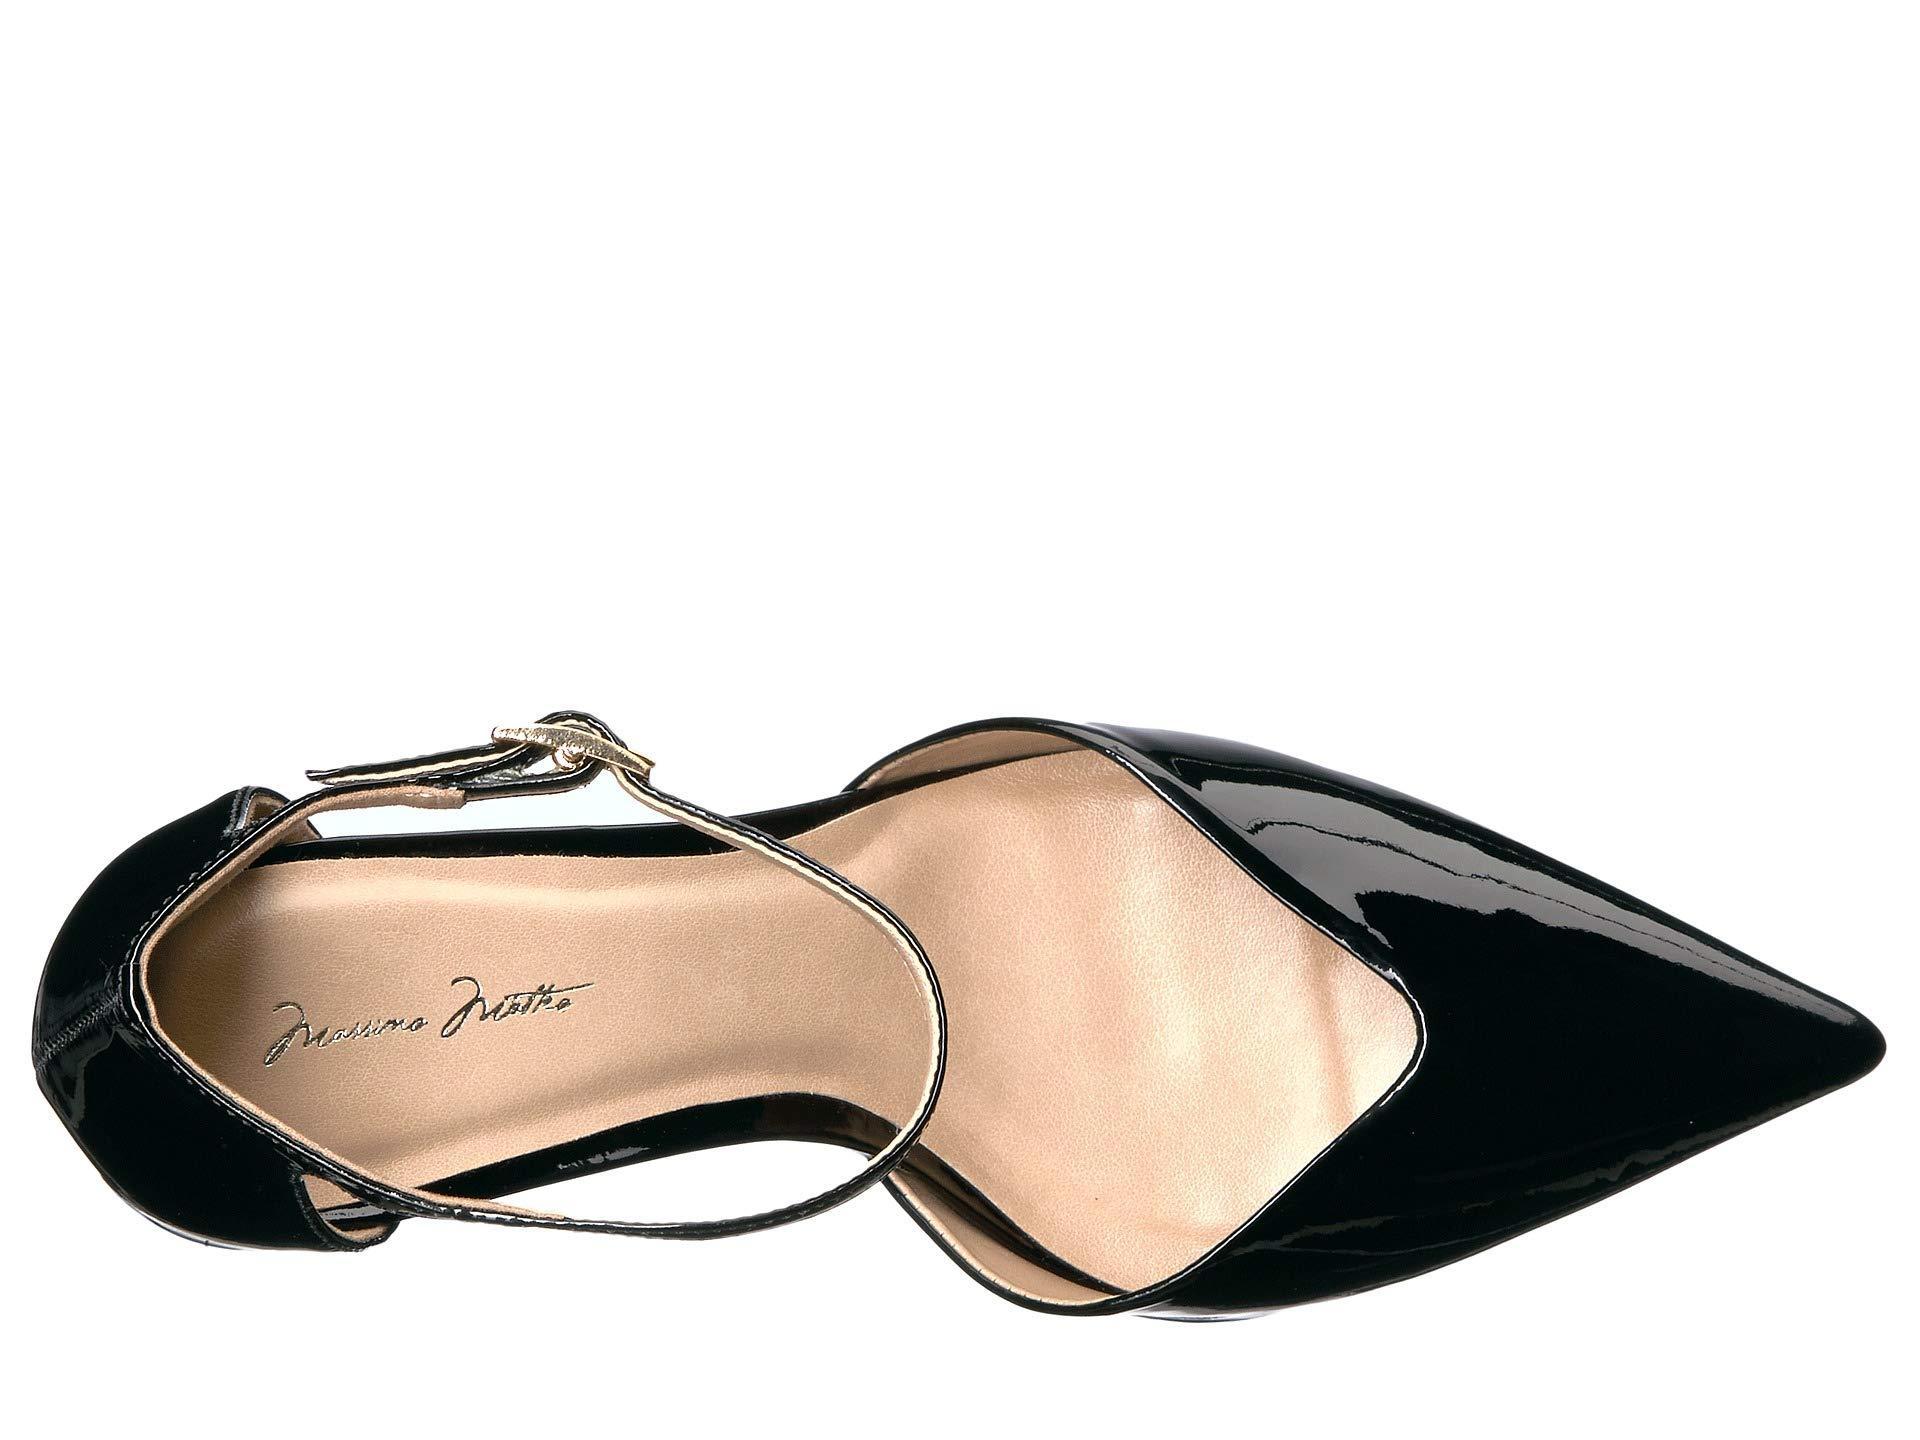 19b961b0b0b6 Massimo Matteo - Randi Pump (black Patent) High Heels - Lyst. View  fullscreen